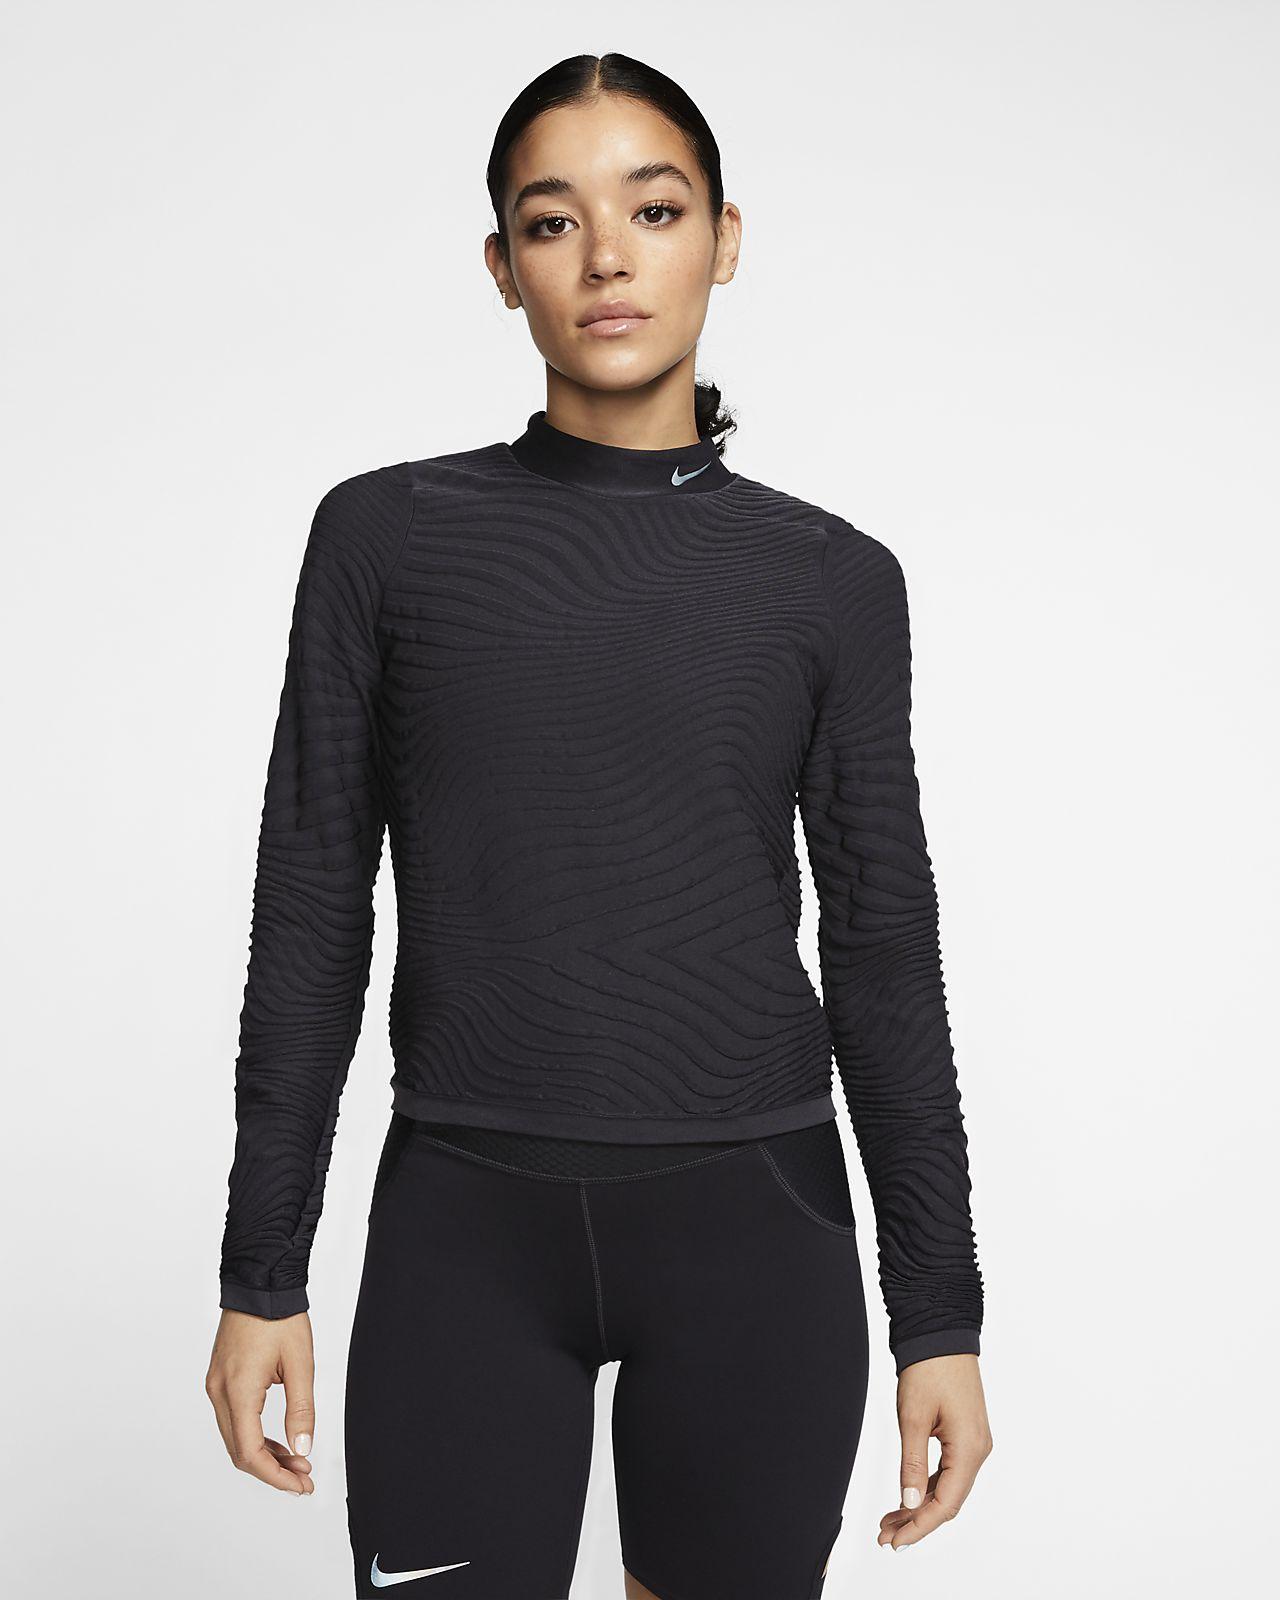 Nike City Ready Women's Running Top